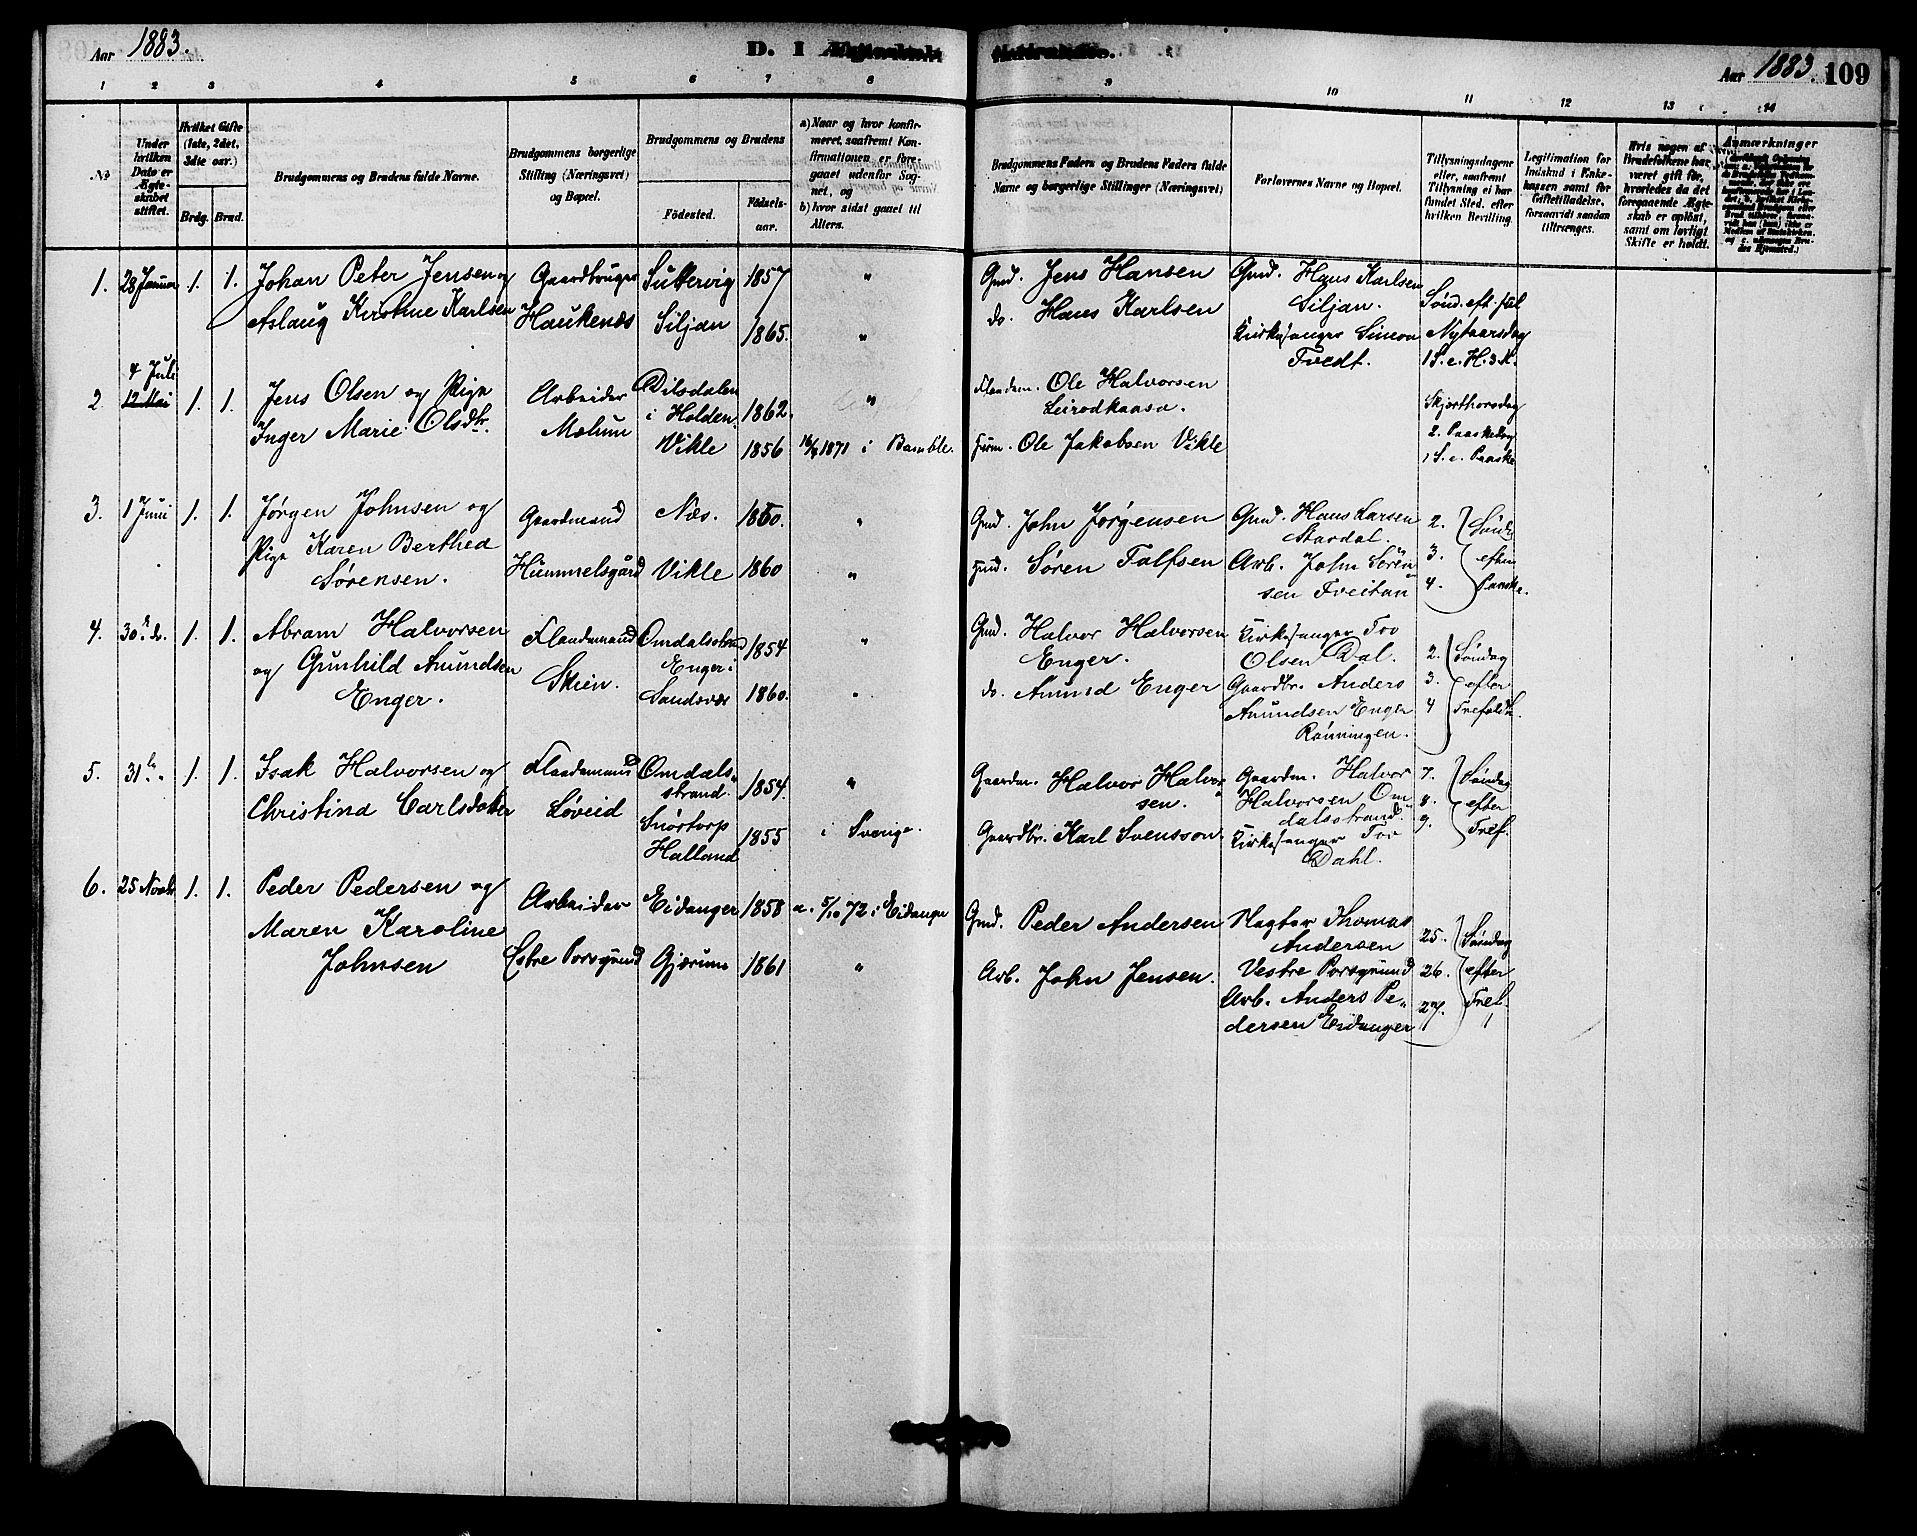 SAKO, Solum kirkebøker, F/Fb/L0001: Ministerialbok nr. II 1, 1877-1892, s. 109